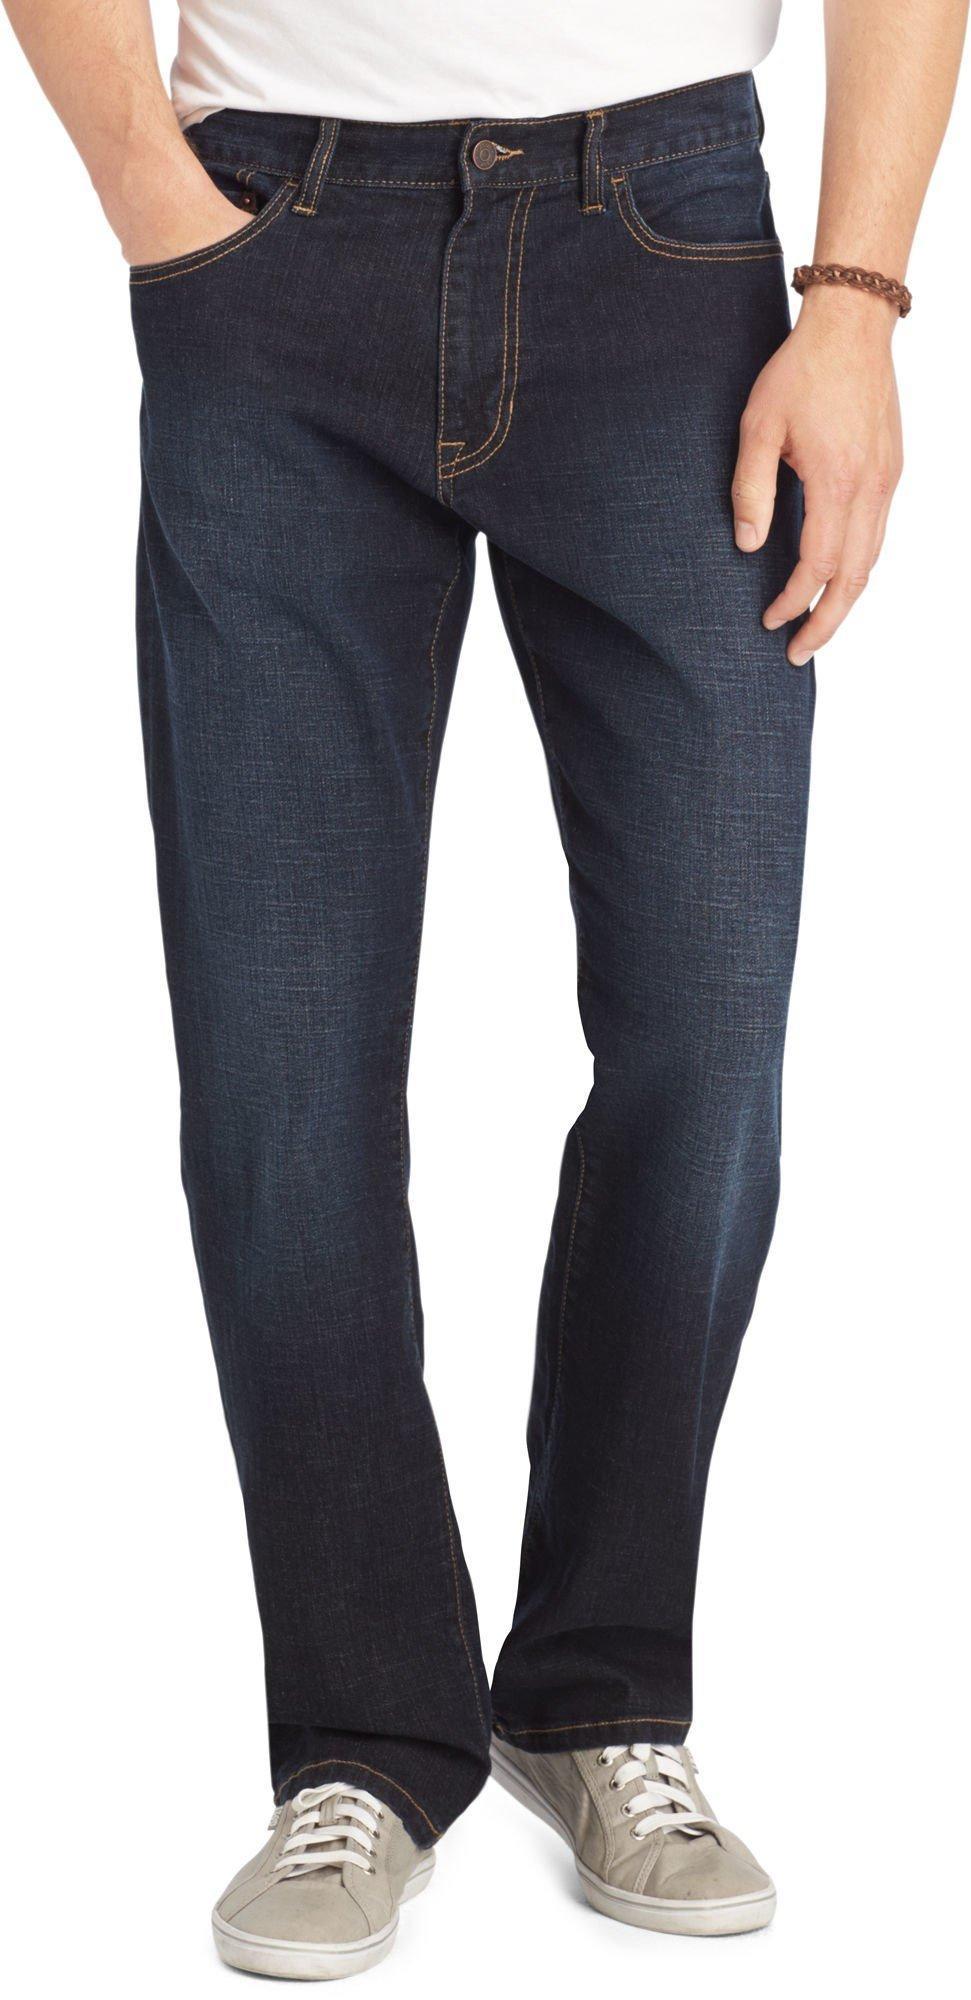 IZOD Mens Relaxed Fit Comfort Jeans | Bealls Florida